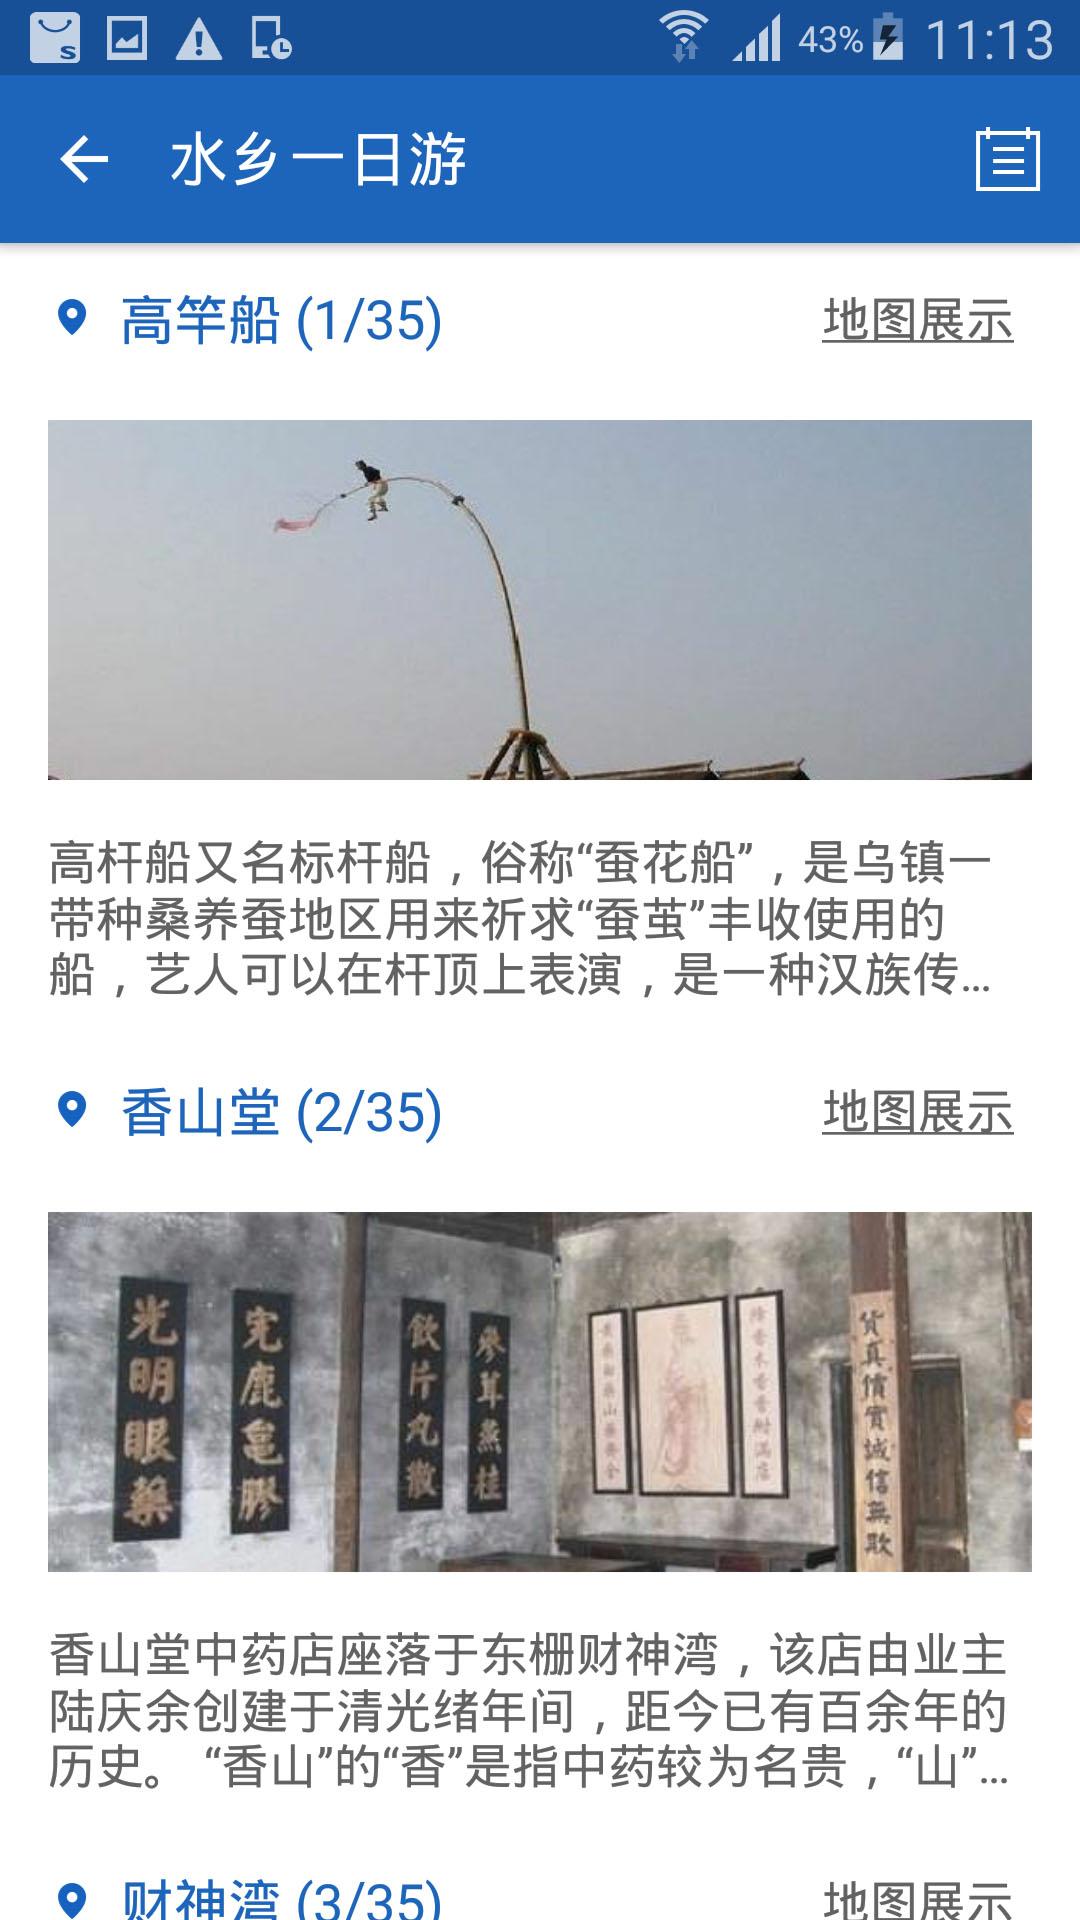 乌镇导游 V6.1.5 安卓版截图5